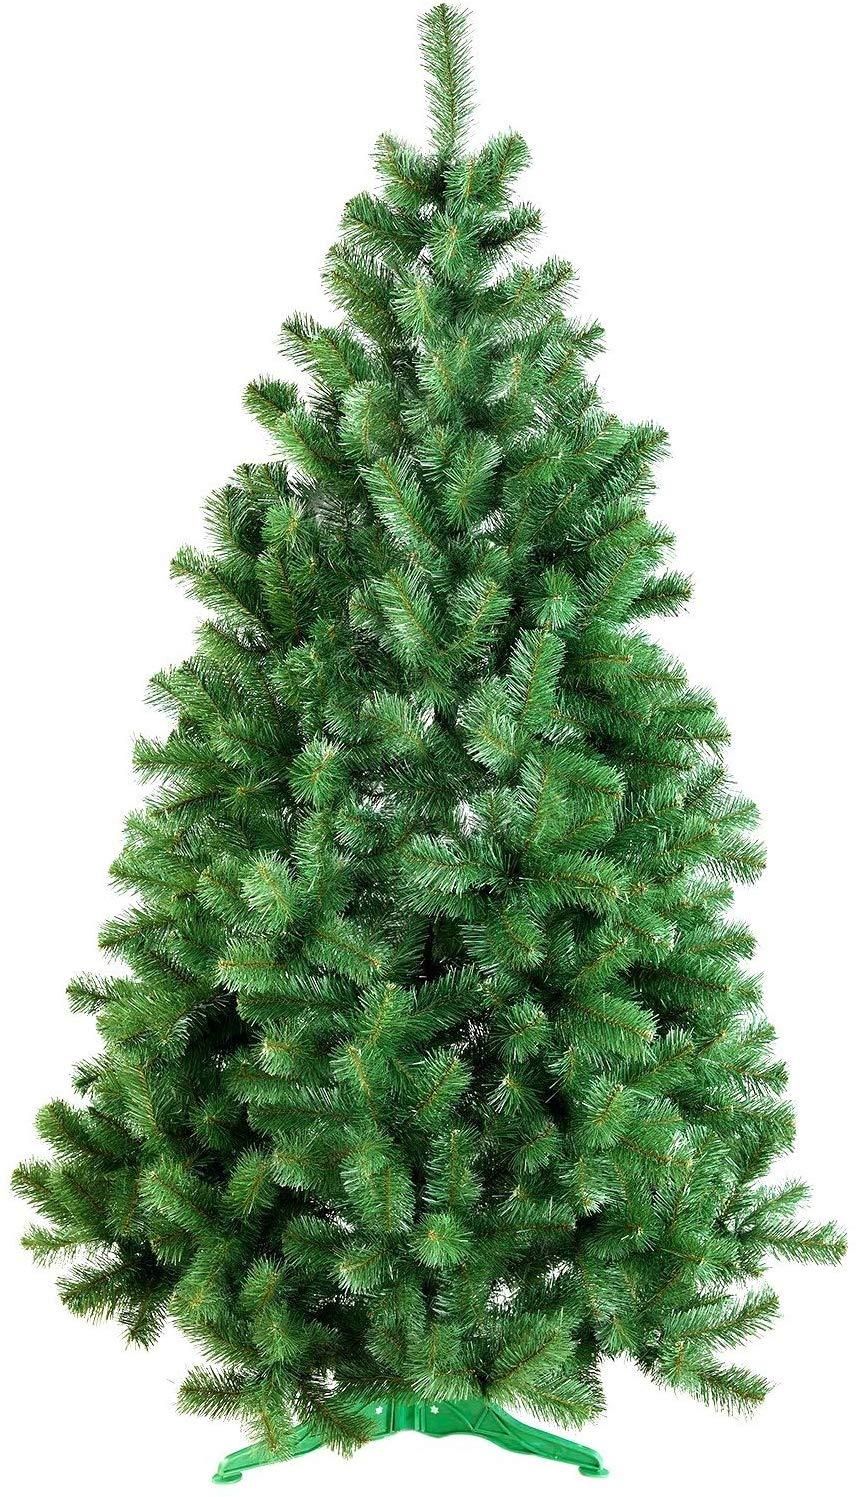 DecoKing 52532 250 cm Lena green fir artificial Christmas tree